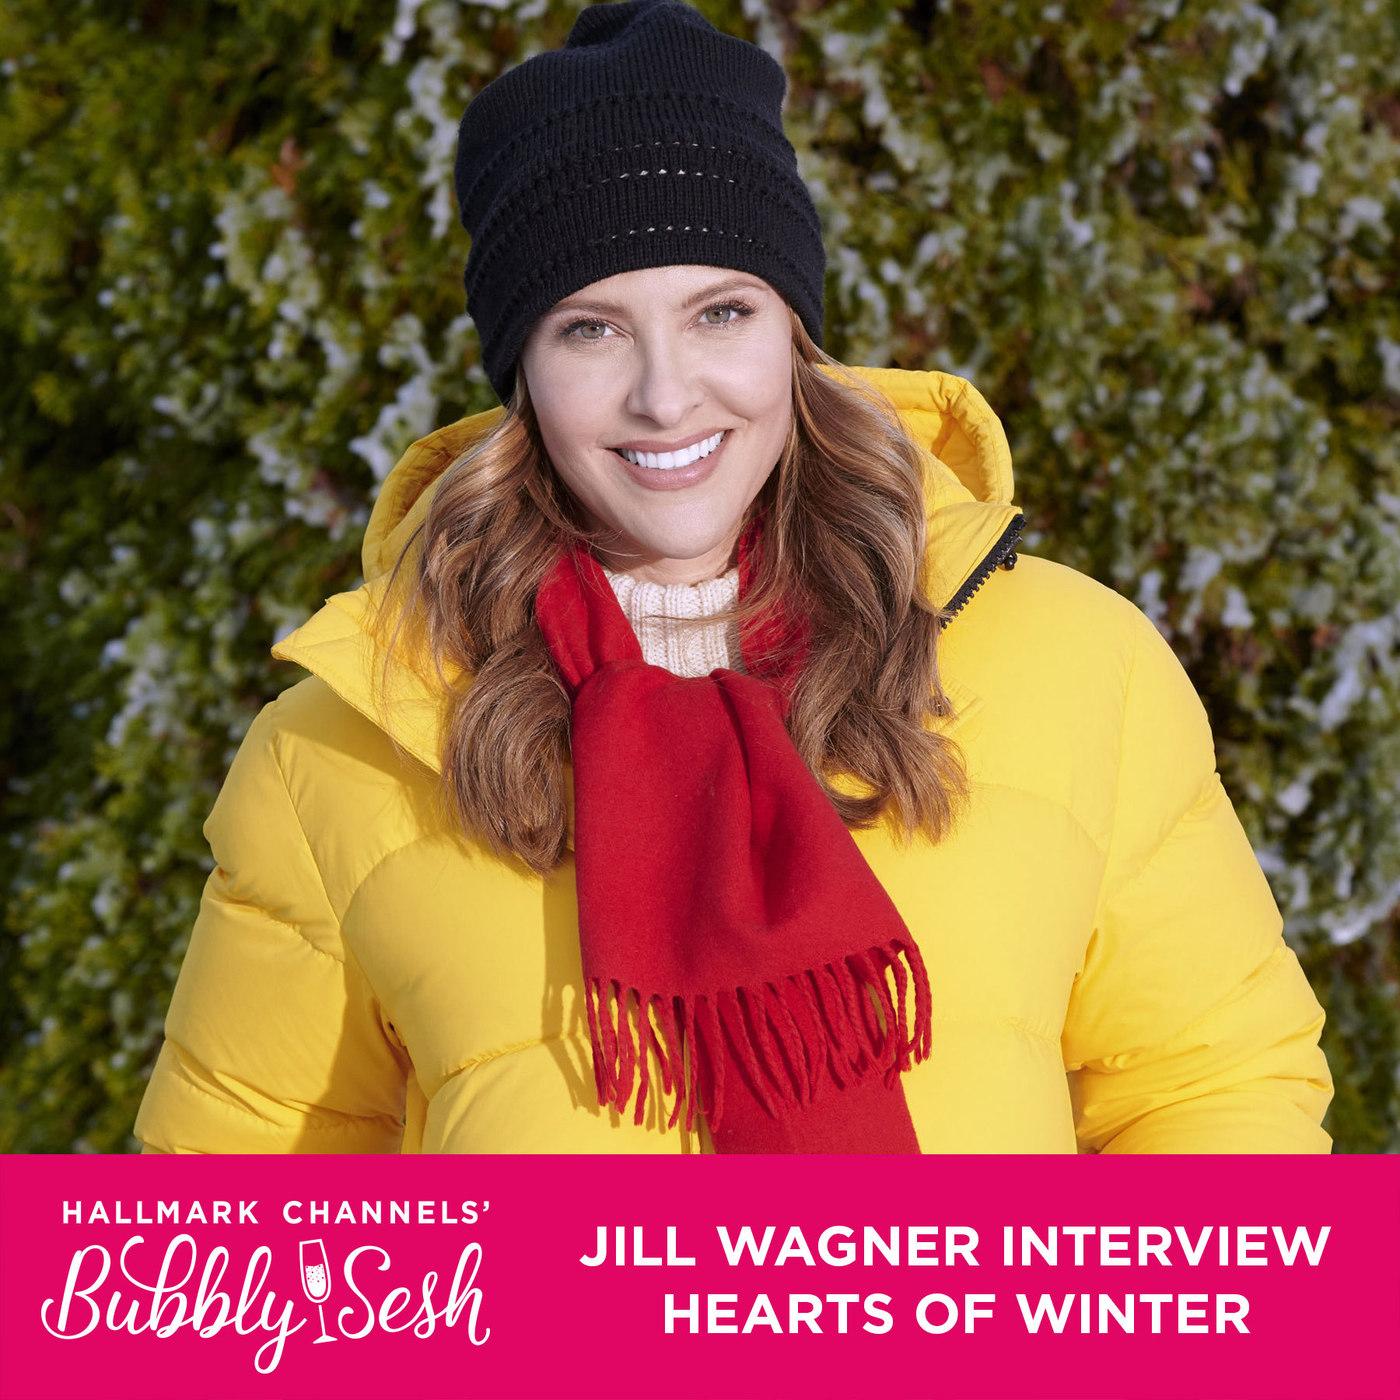 Jill Wagner Interview, Hearts of Winter